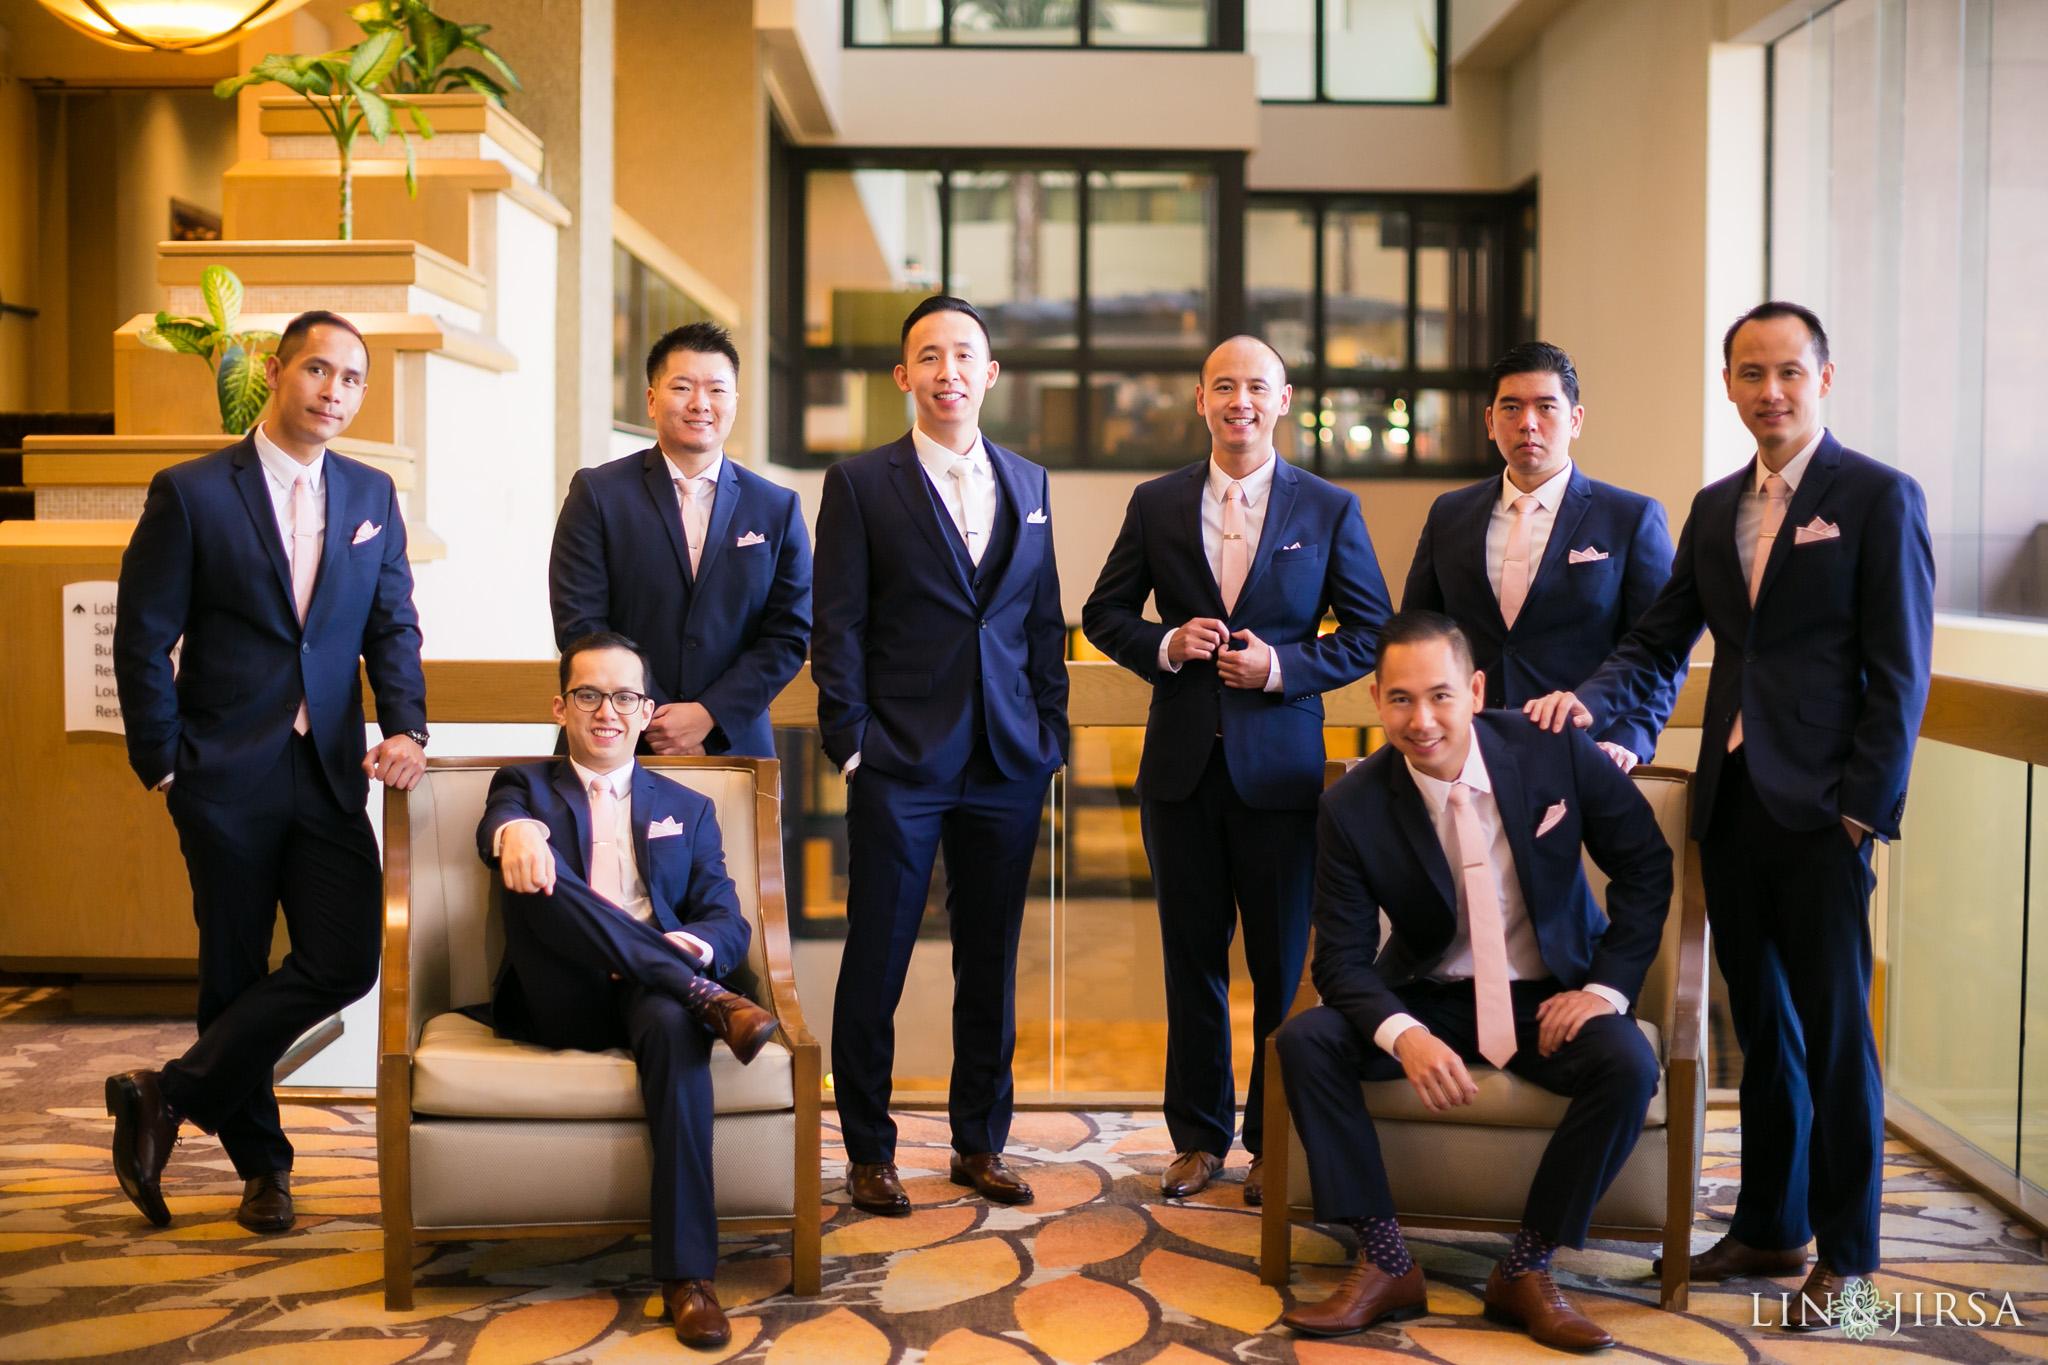 07 hilton costa mesa groomsmen wedding photography